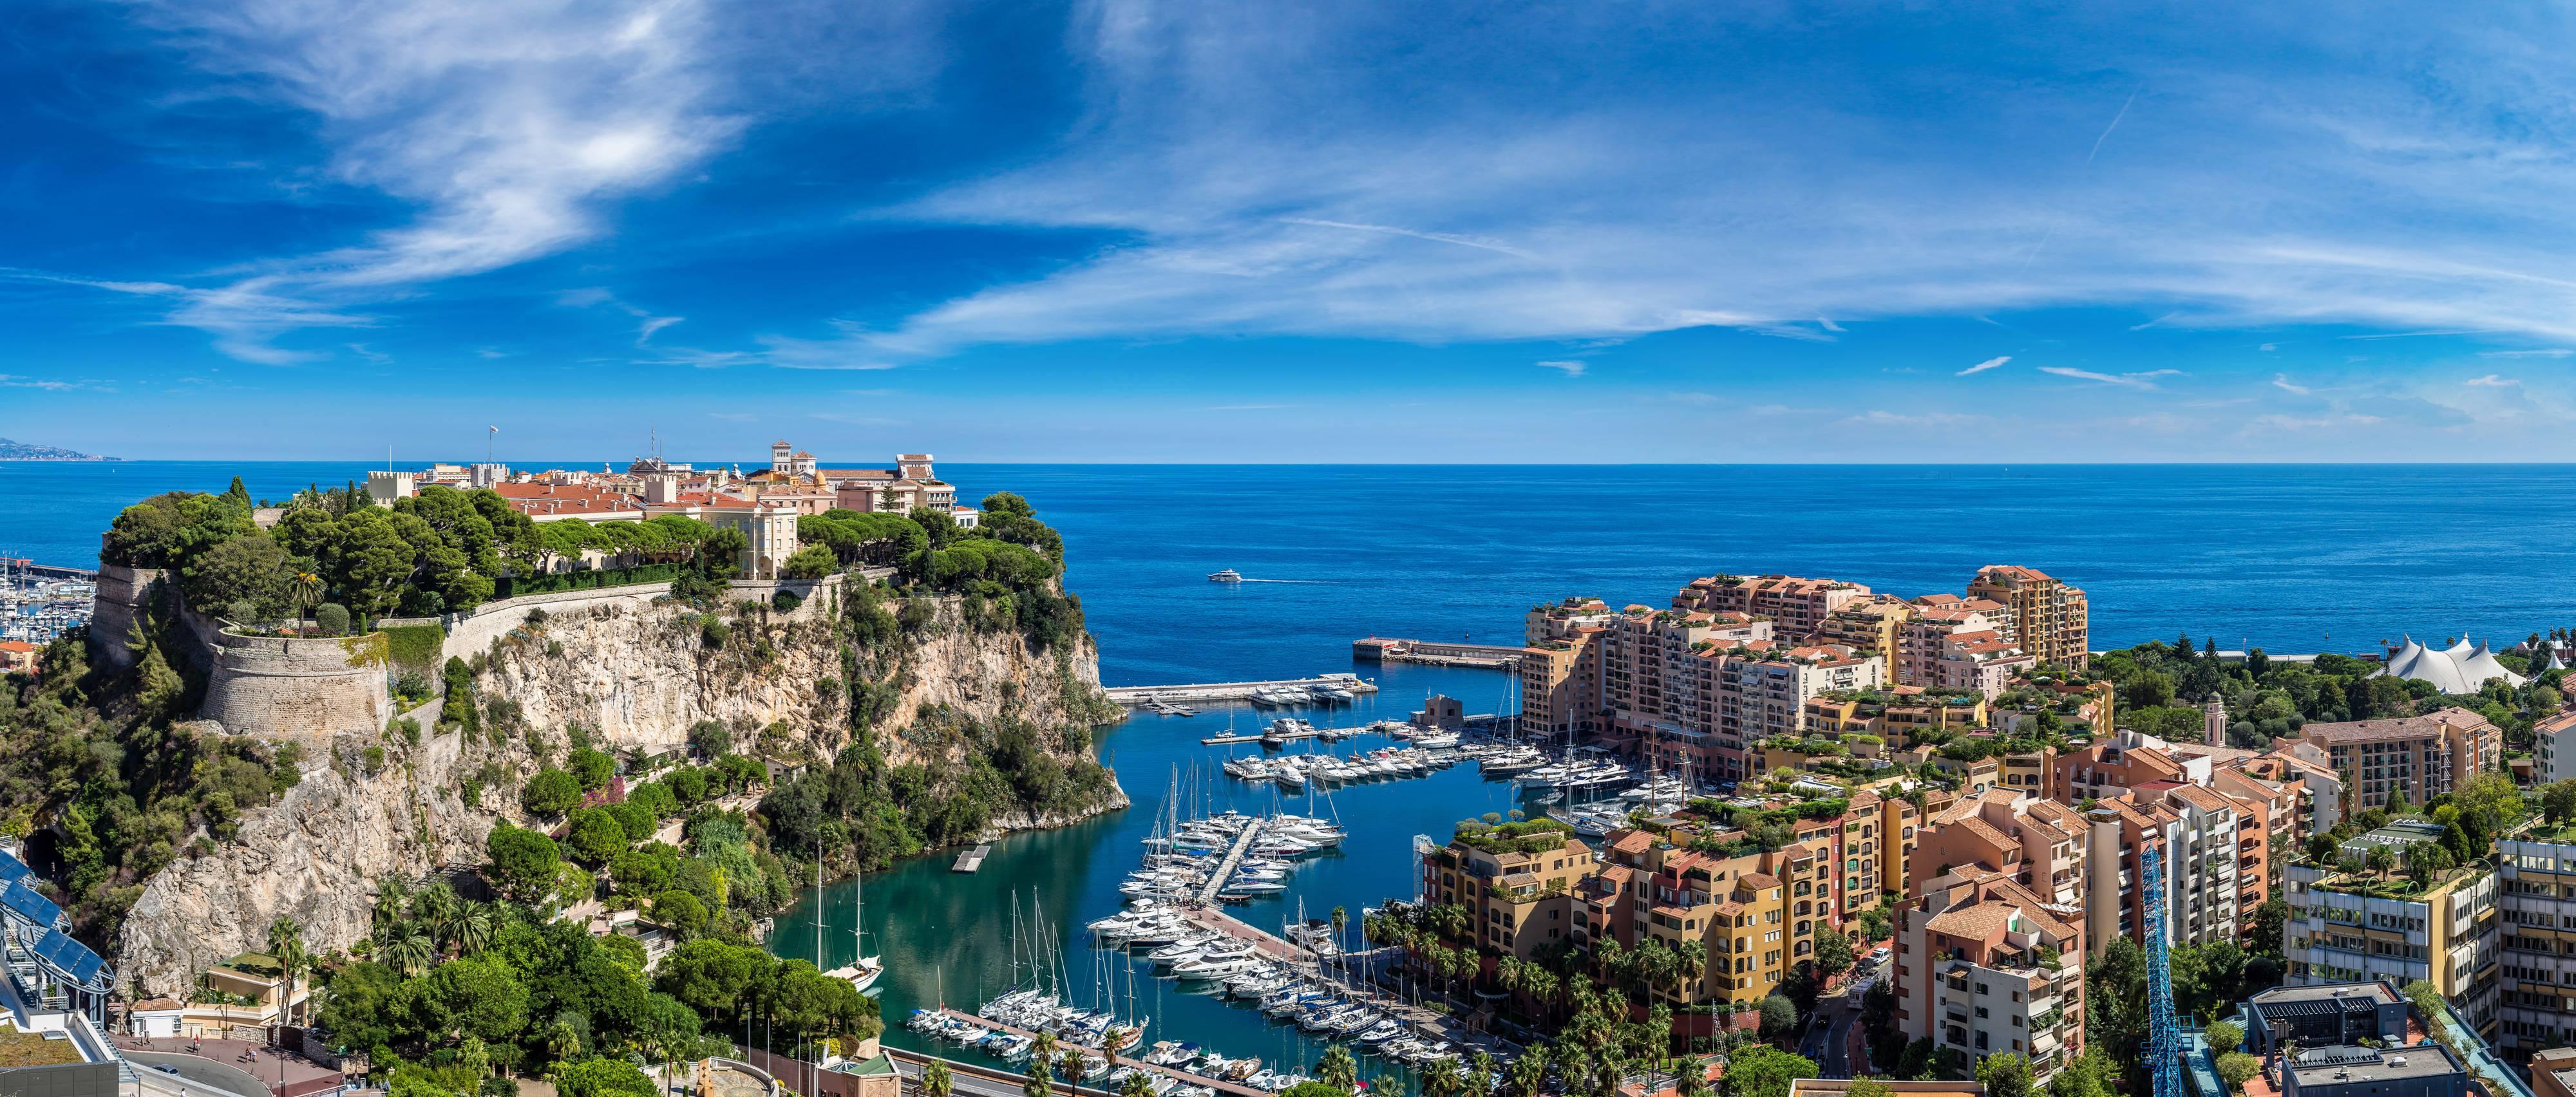 Monaco-day-trip